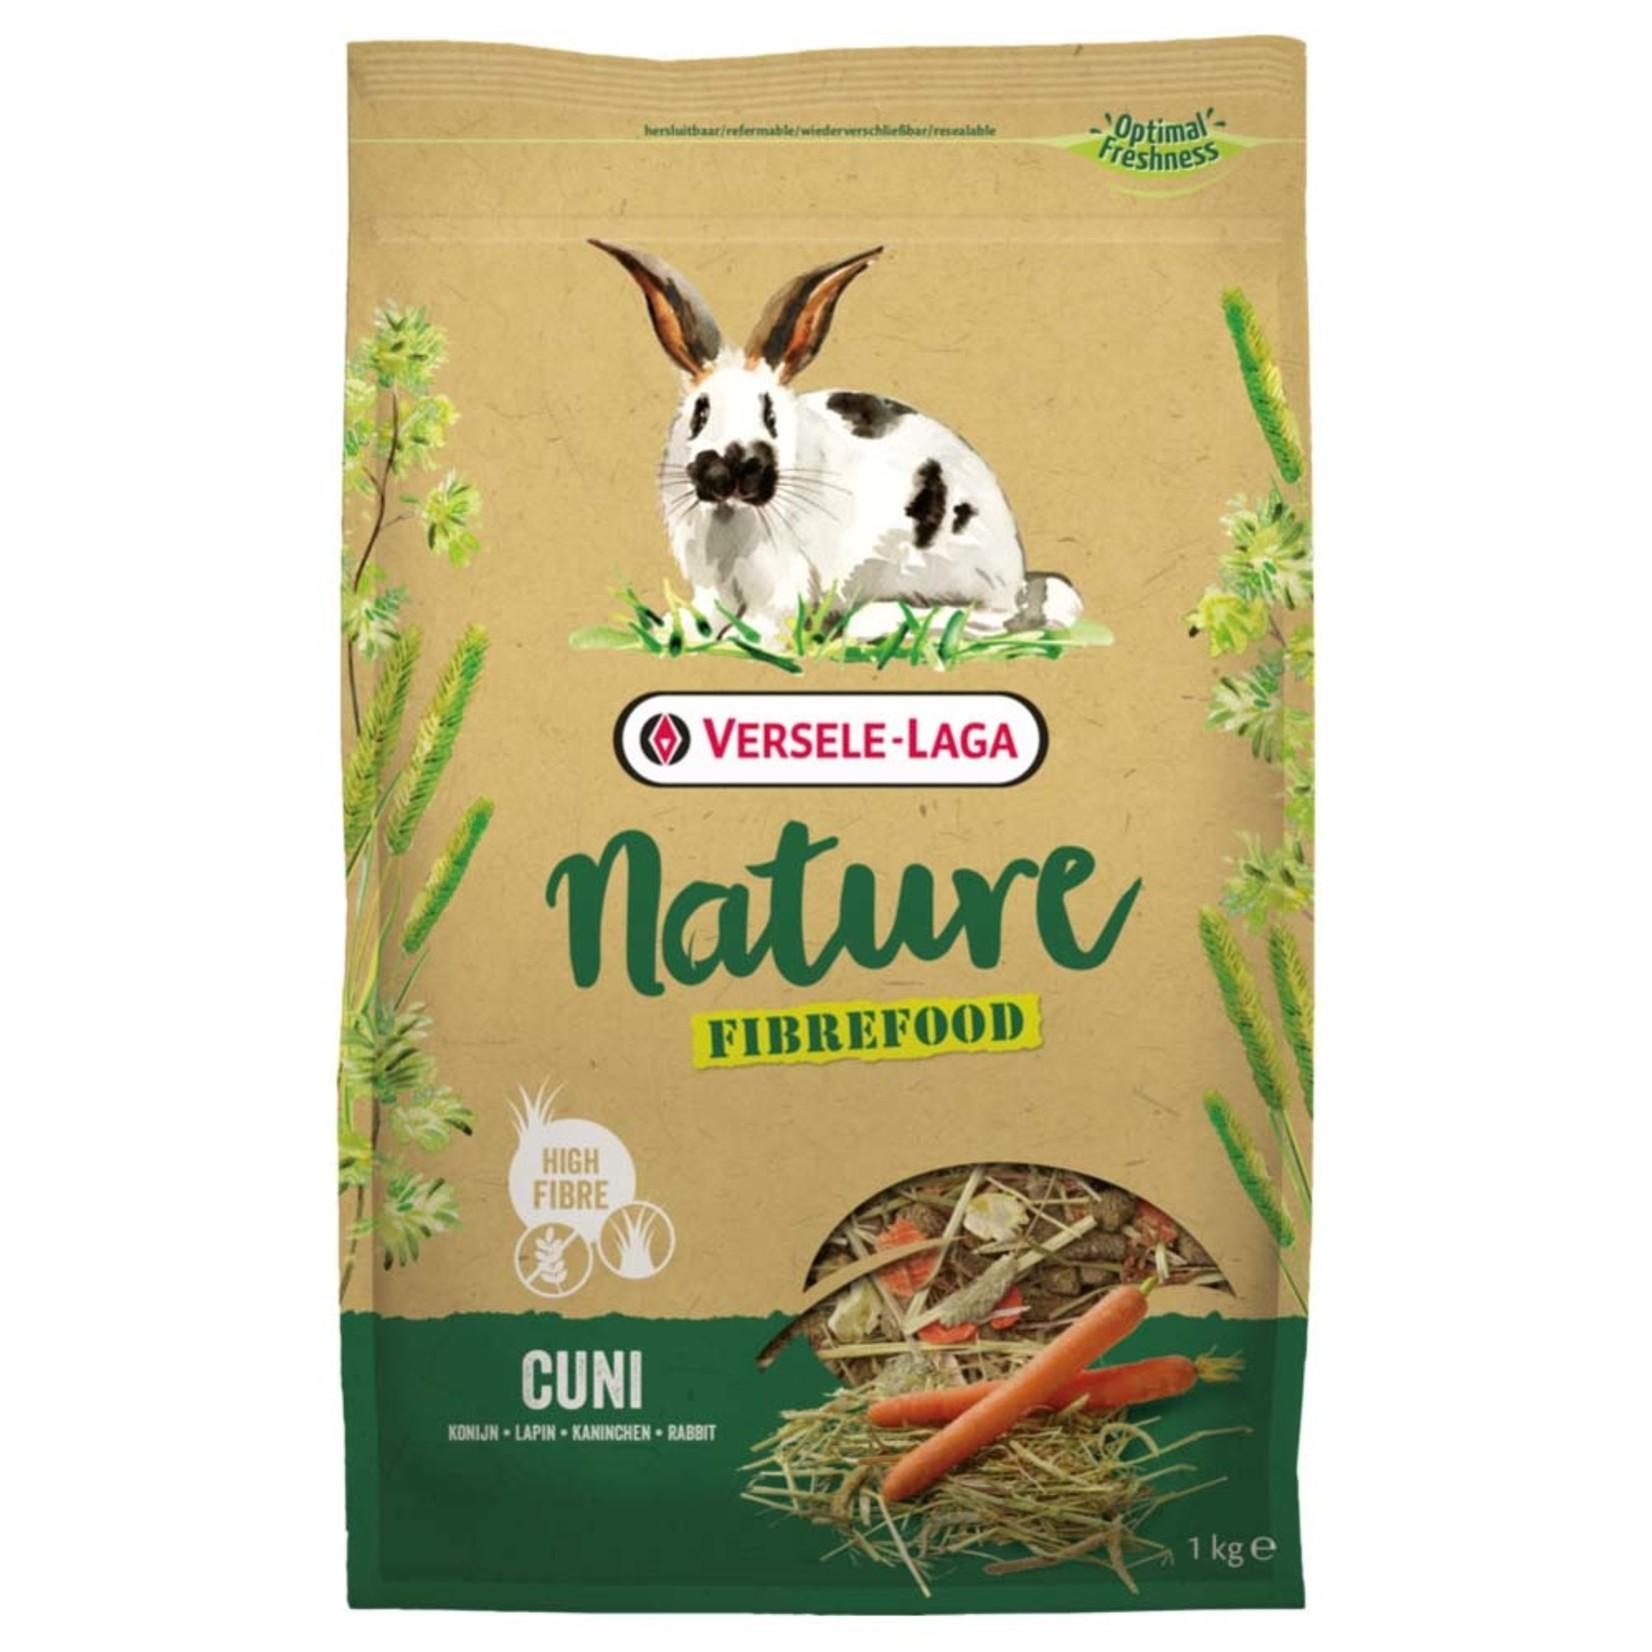 Versele-Laga Nature forage blend Rabbit food 1.36 kg